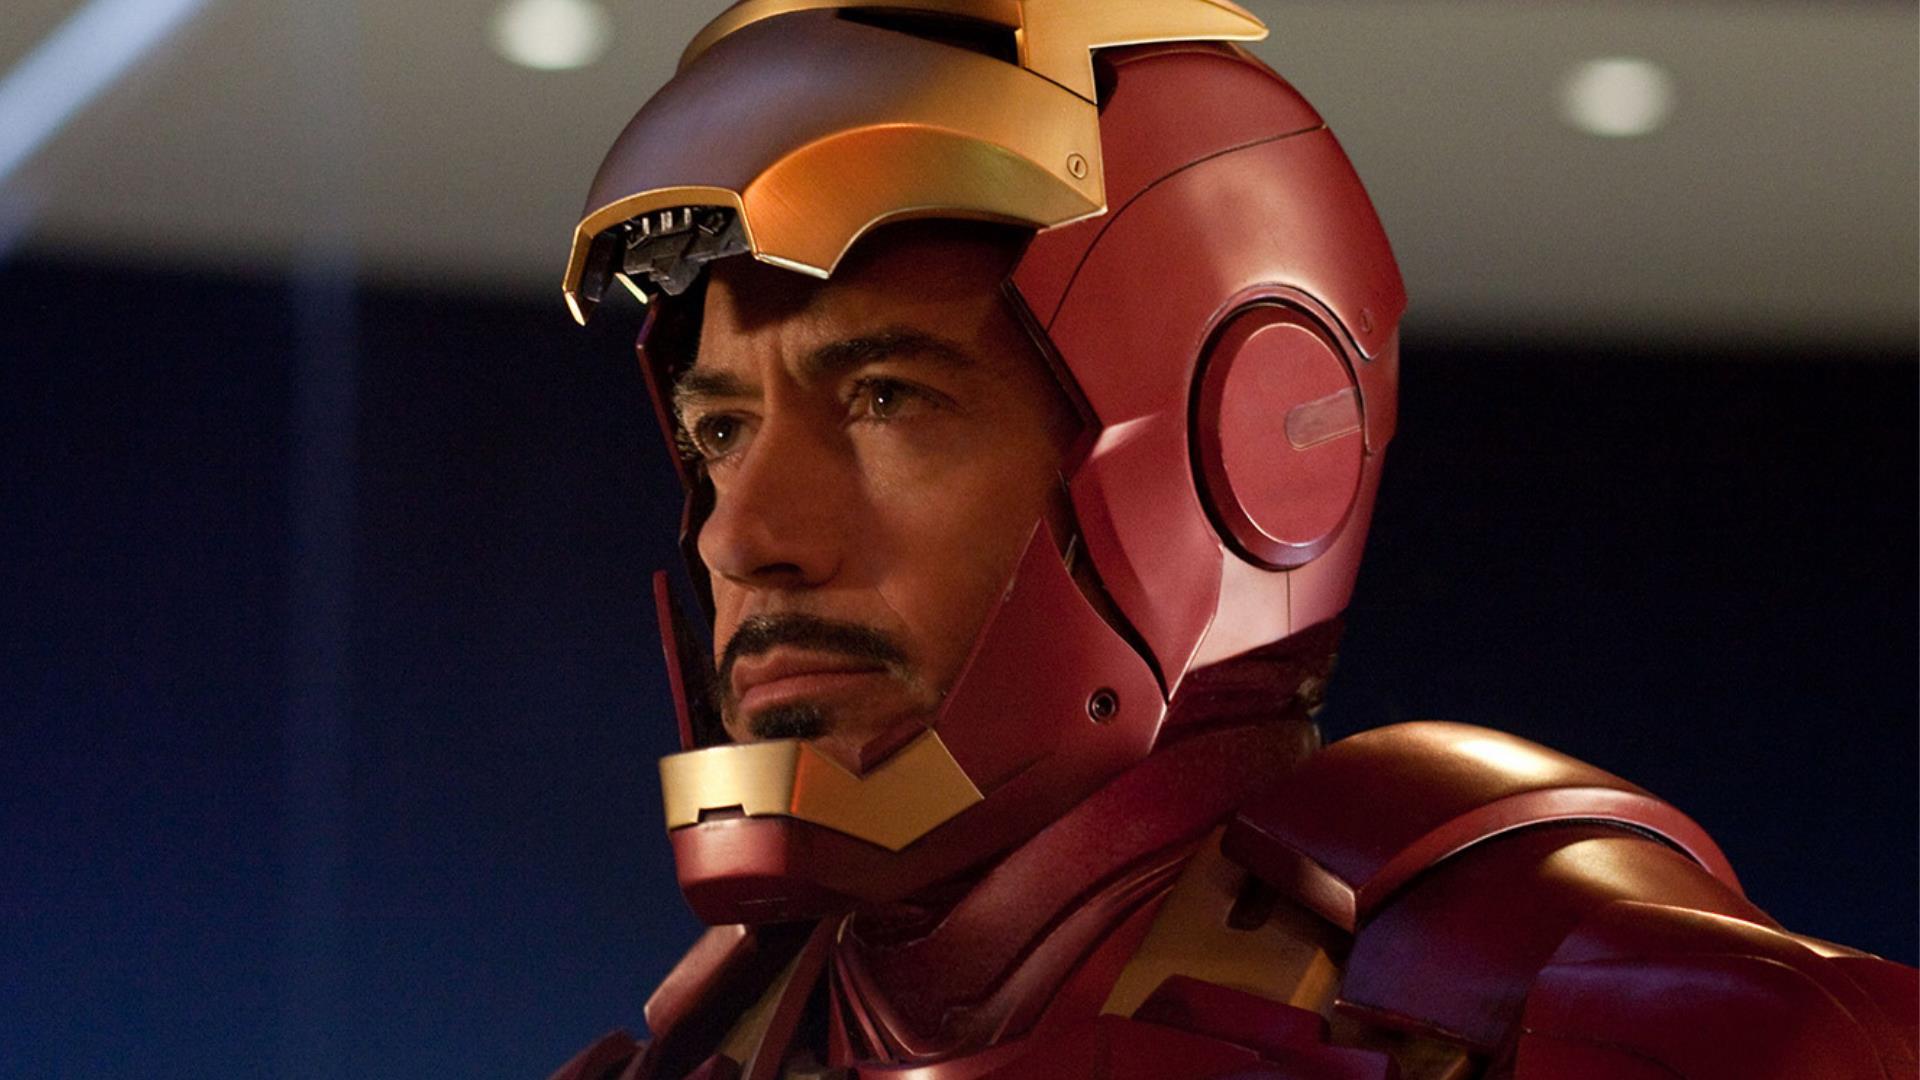 Robert Downey Jr. prova per la prima volta l'elmetto di Iron Man: la foto torna a conquistare i fan